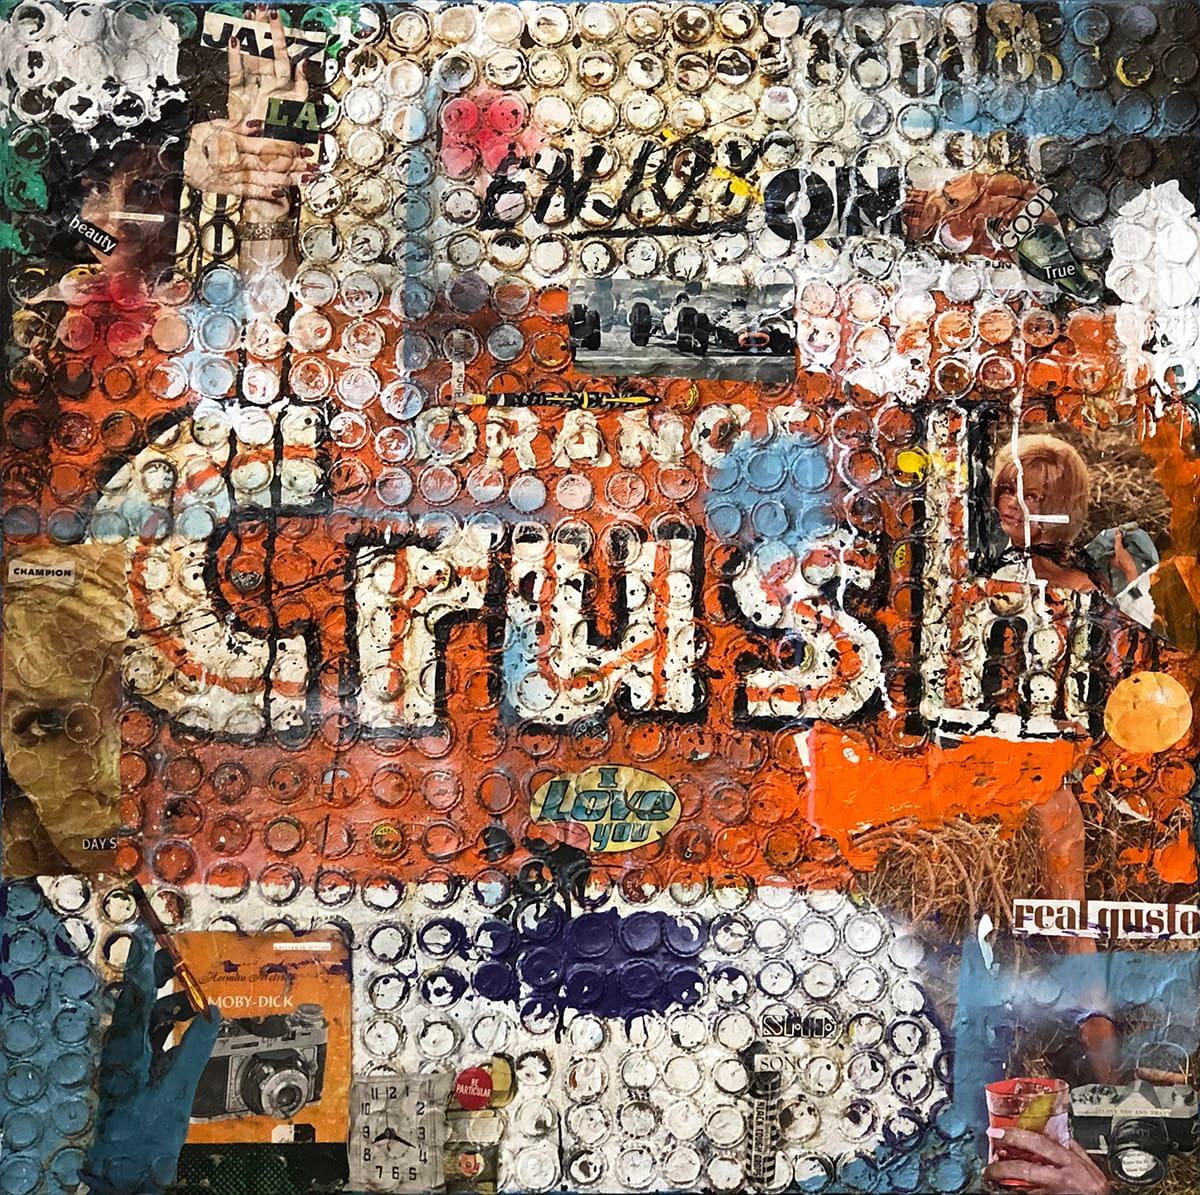 orangecrush greg miller joanne artman gallery